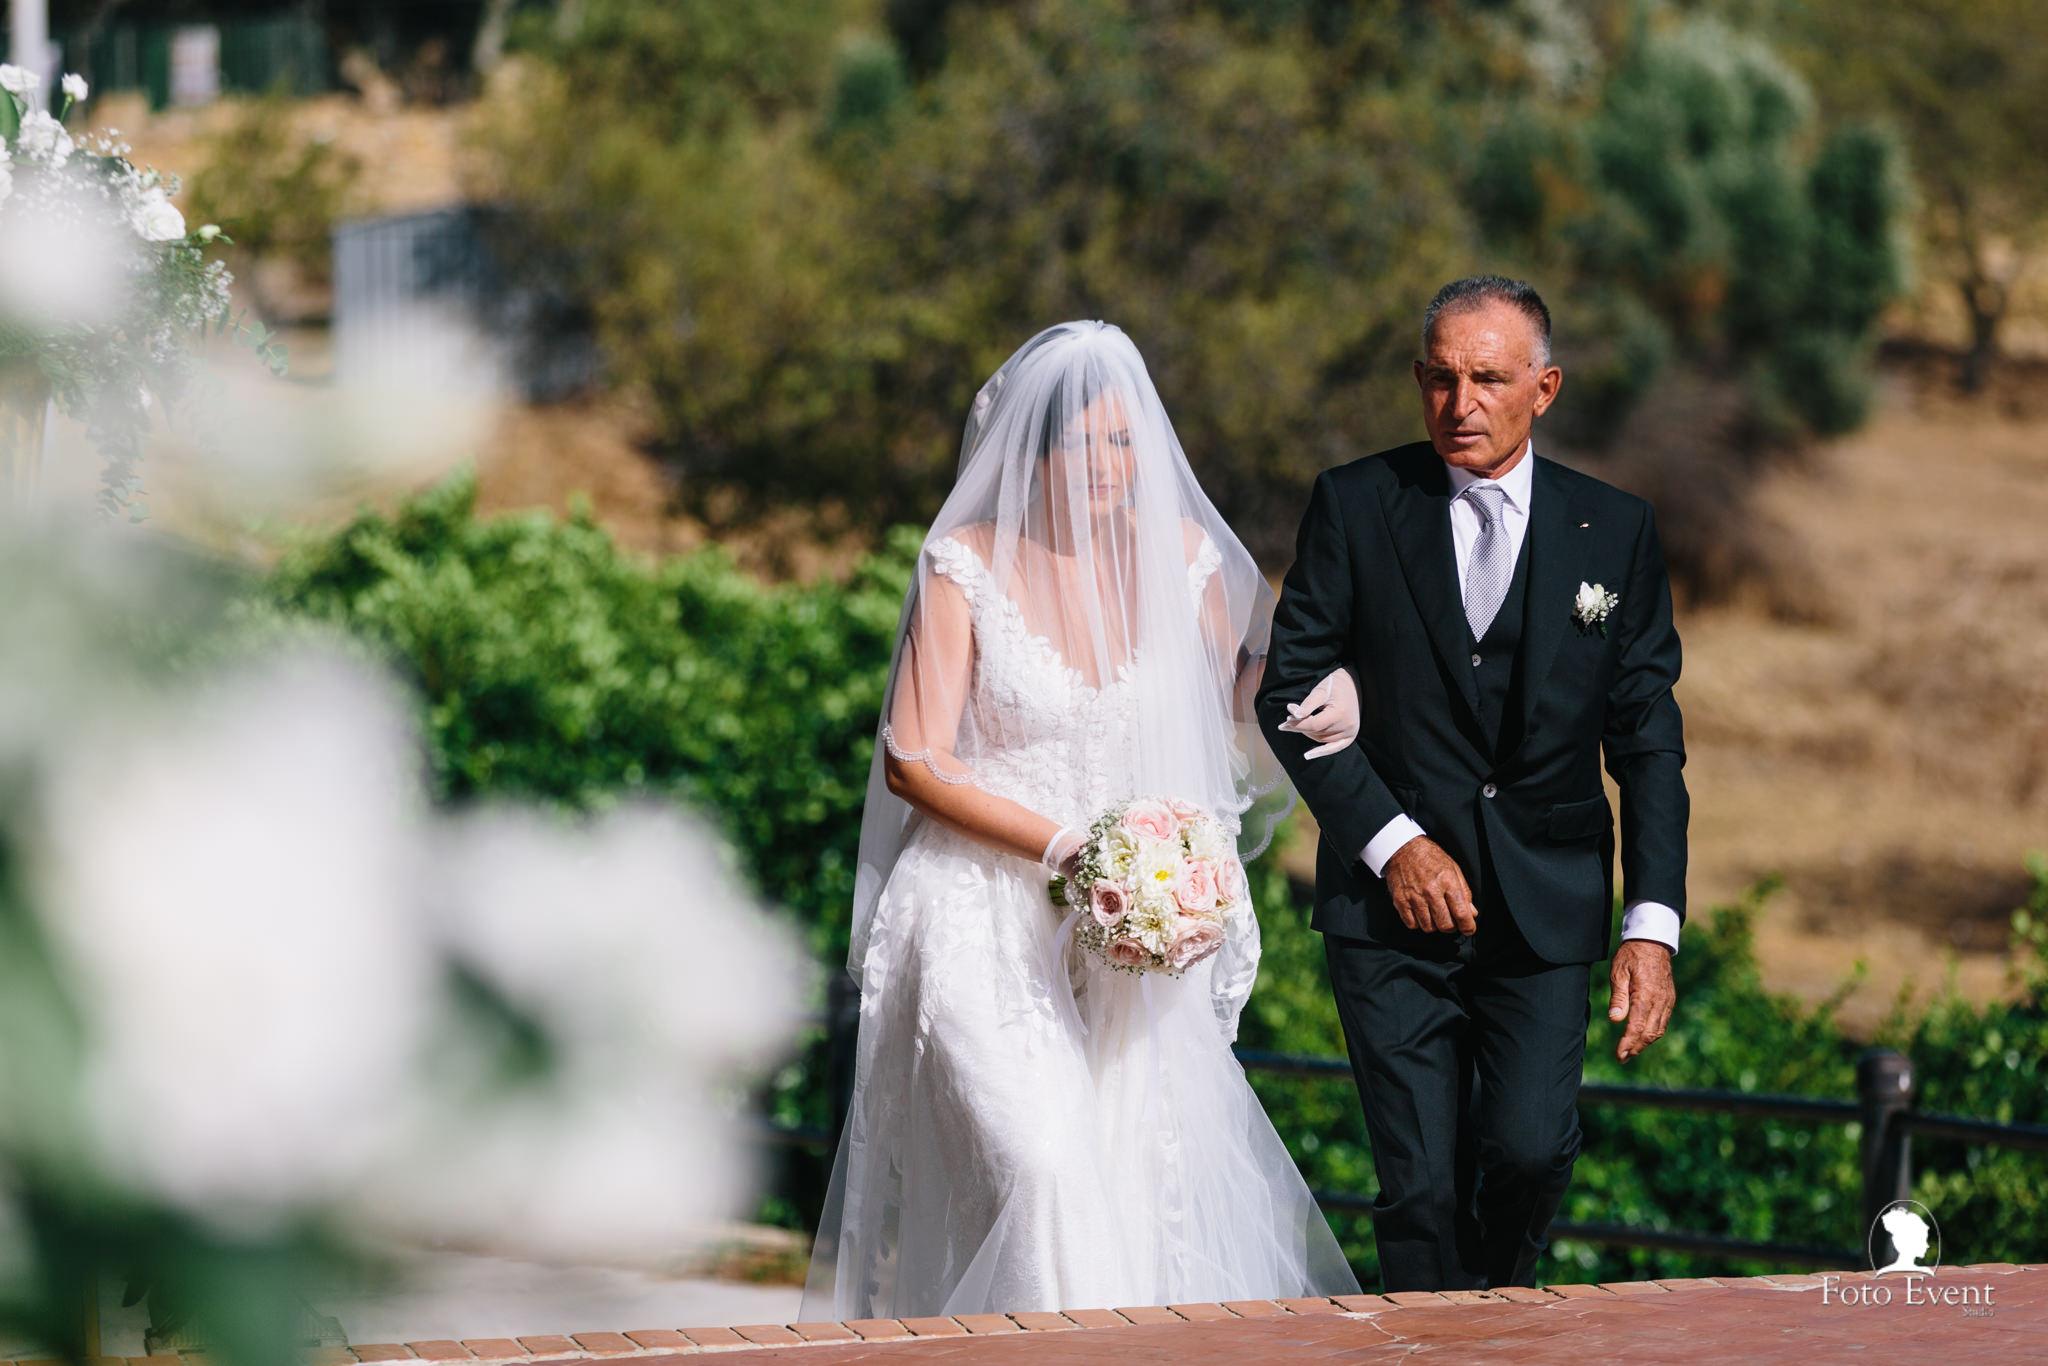 021-2019-09-09-Matrimonio-Dorotea-e-Alberto-Iemmolo-zoom-260